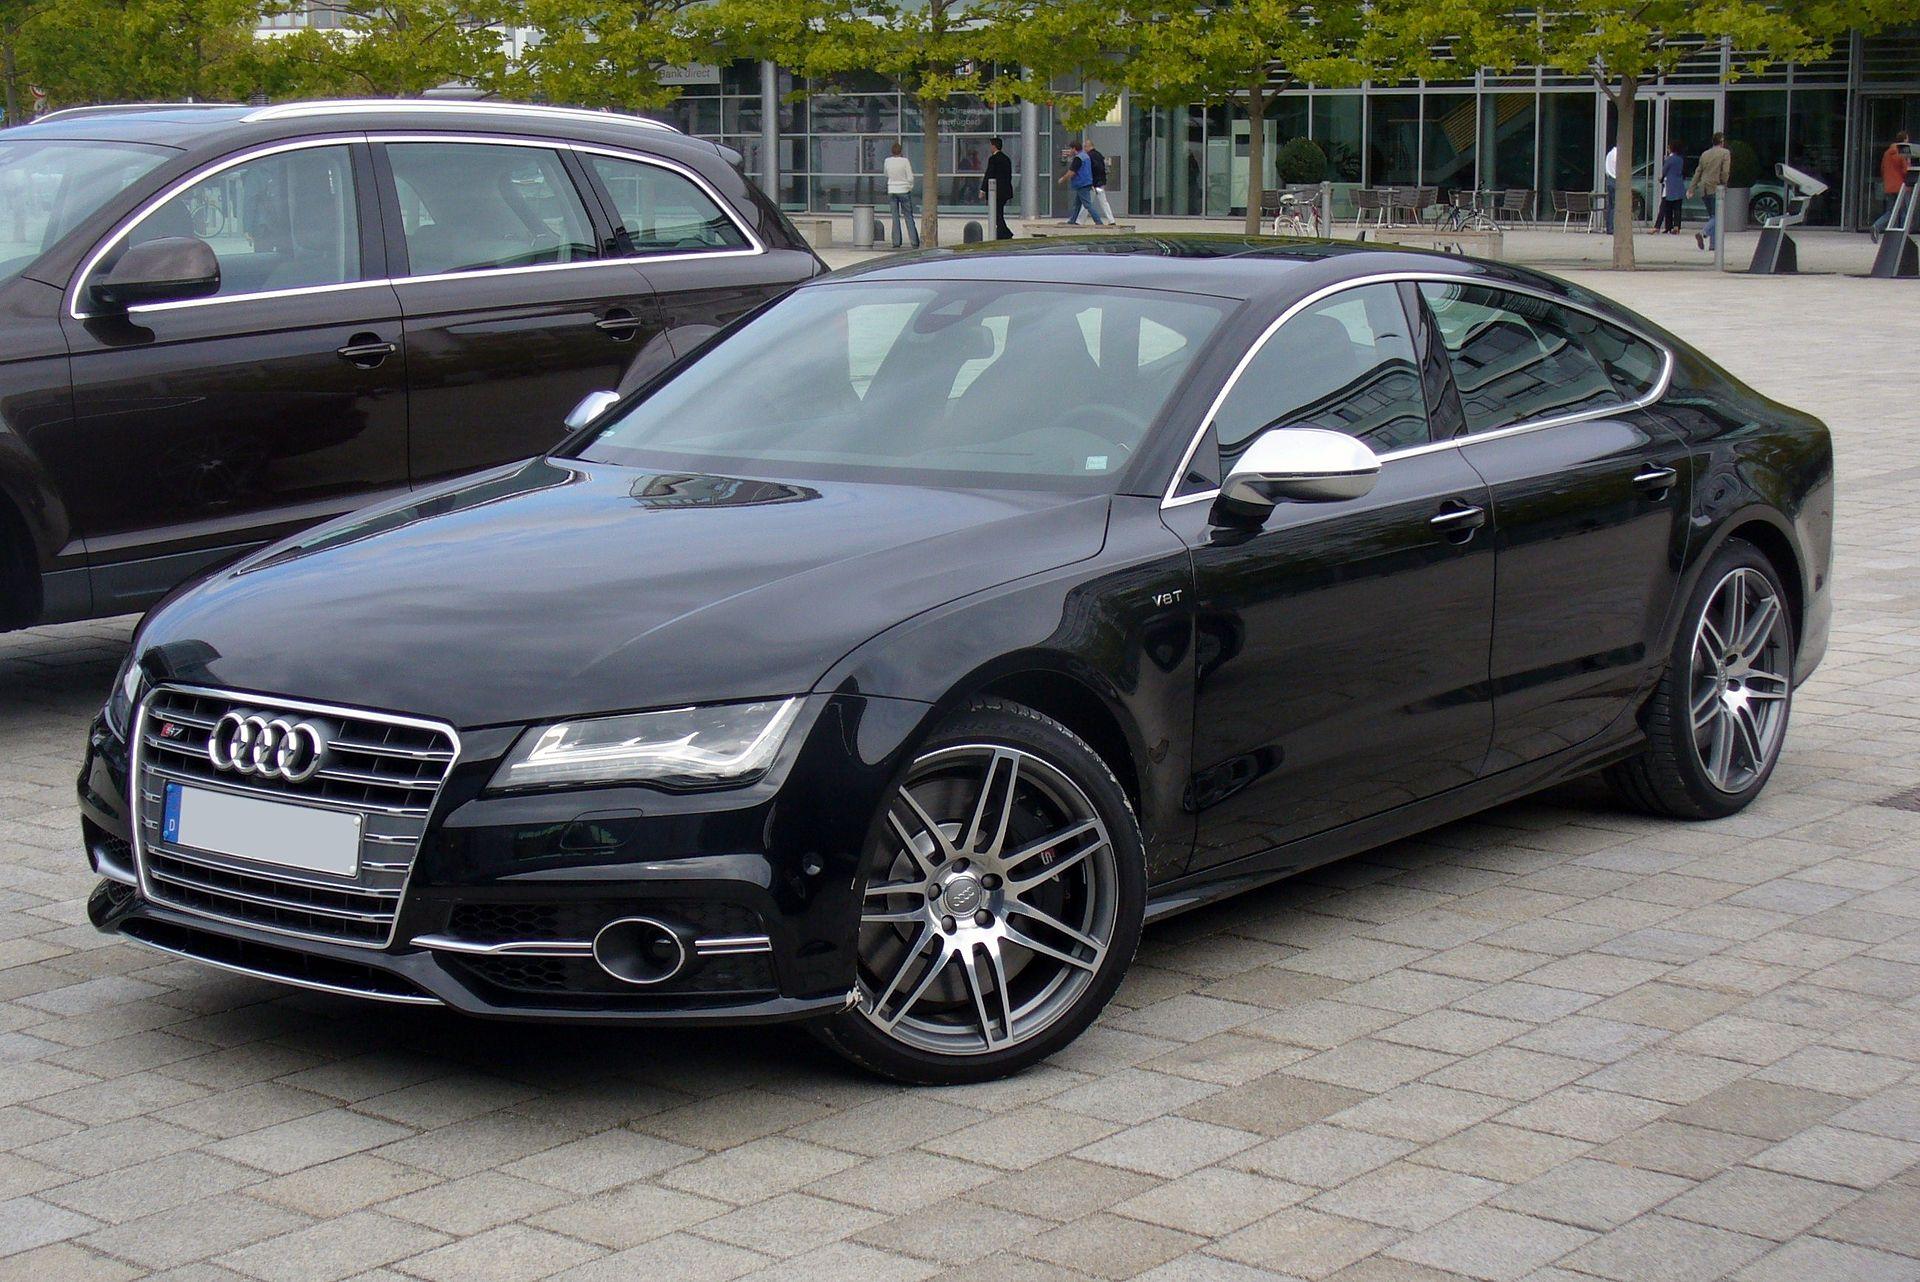 Audi A7 Wikipedia